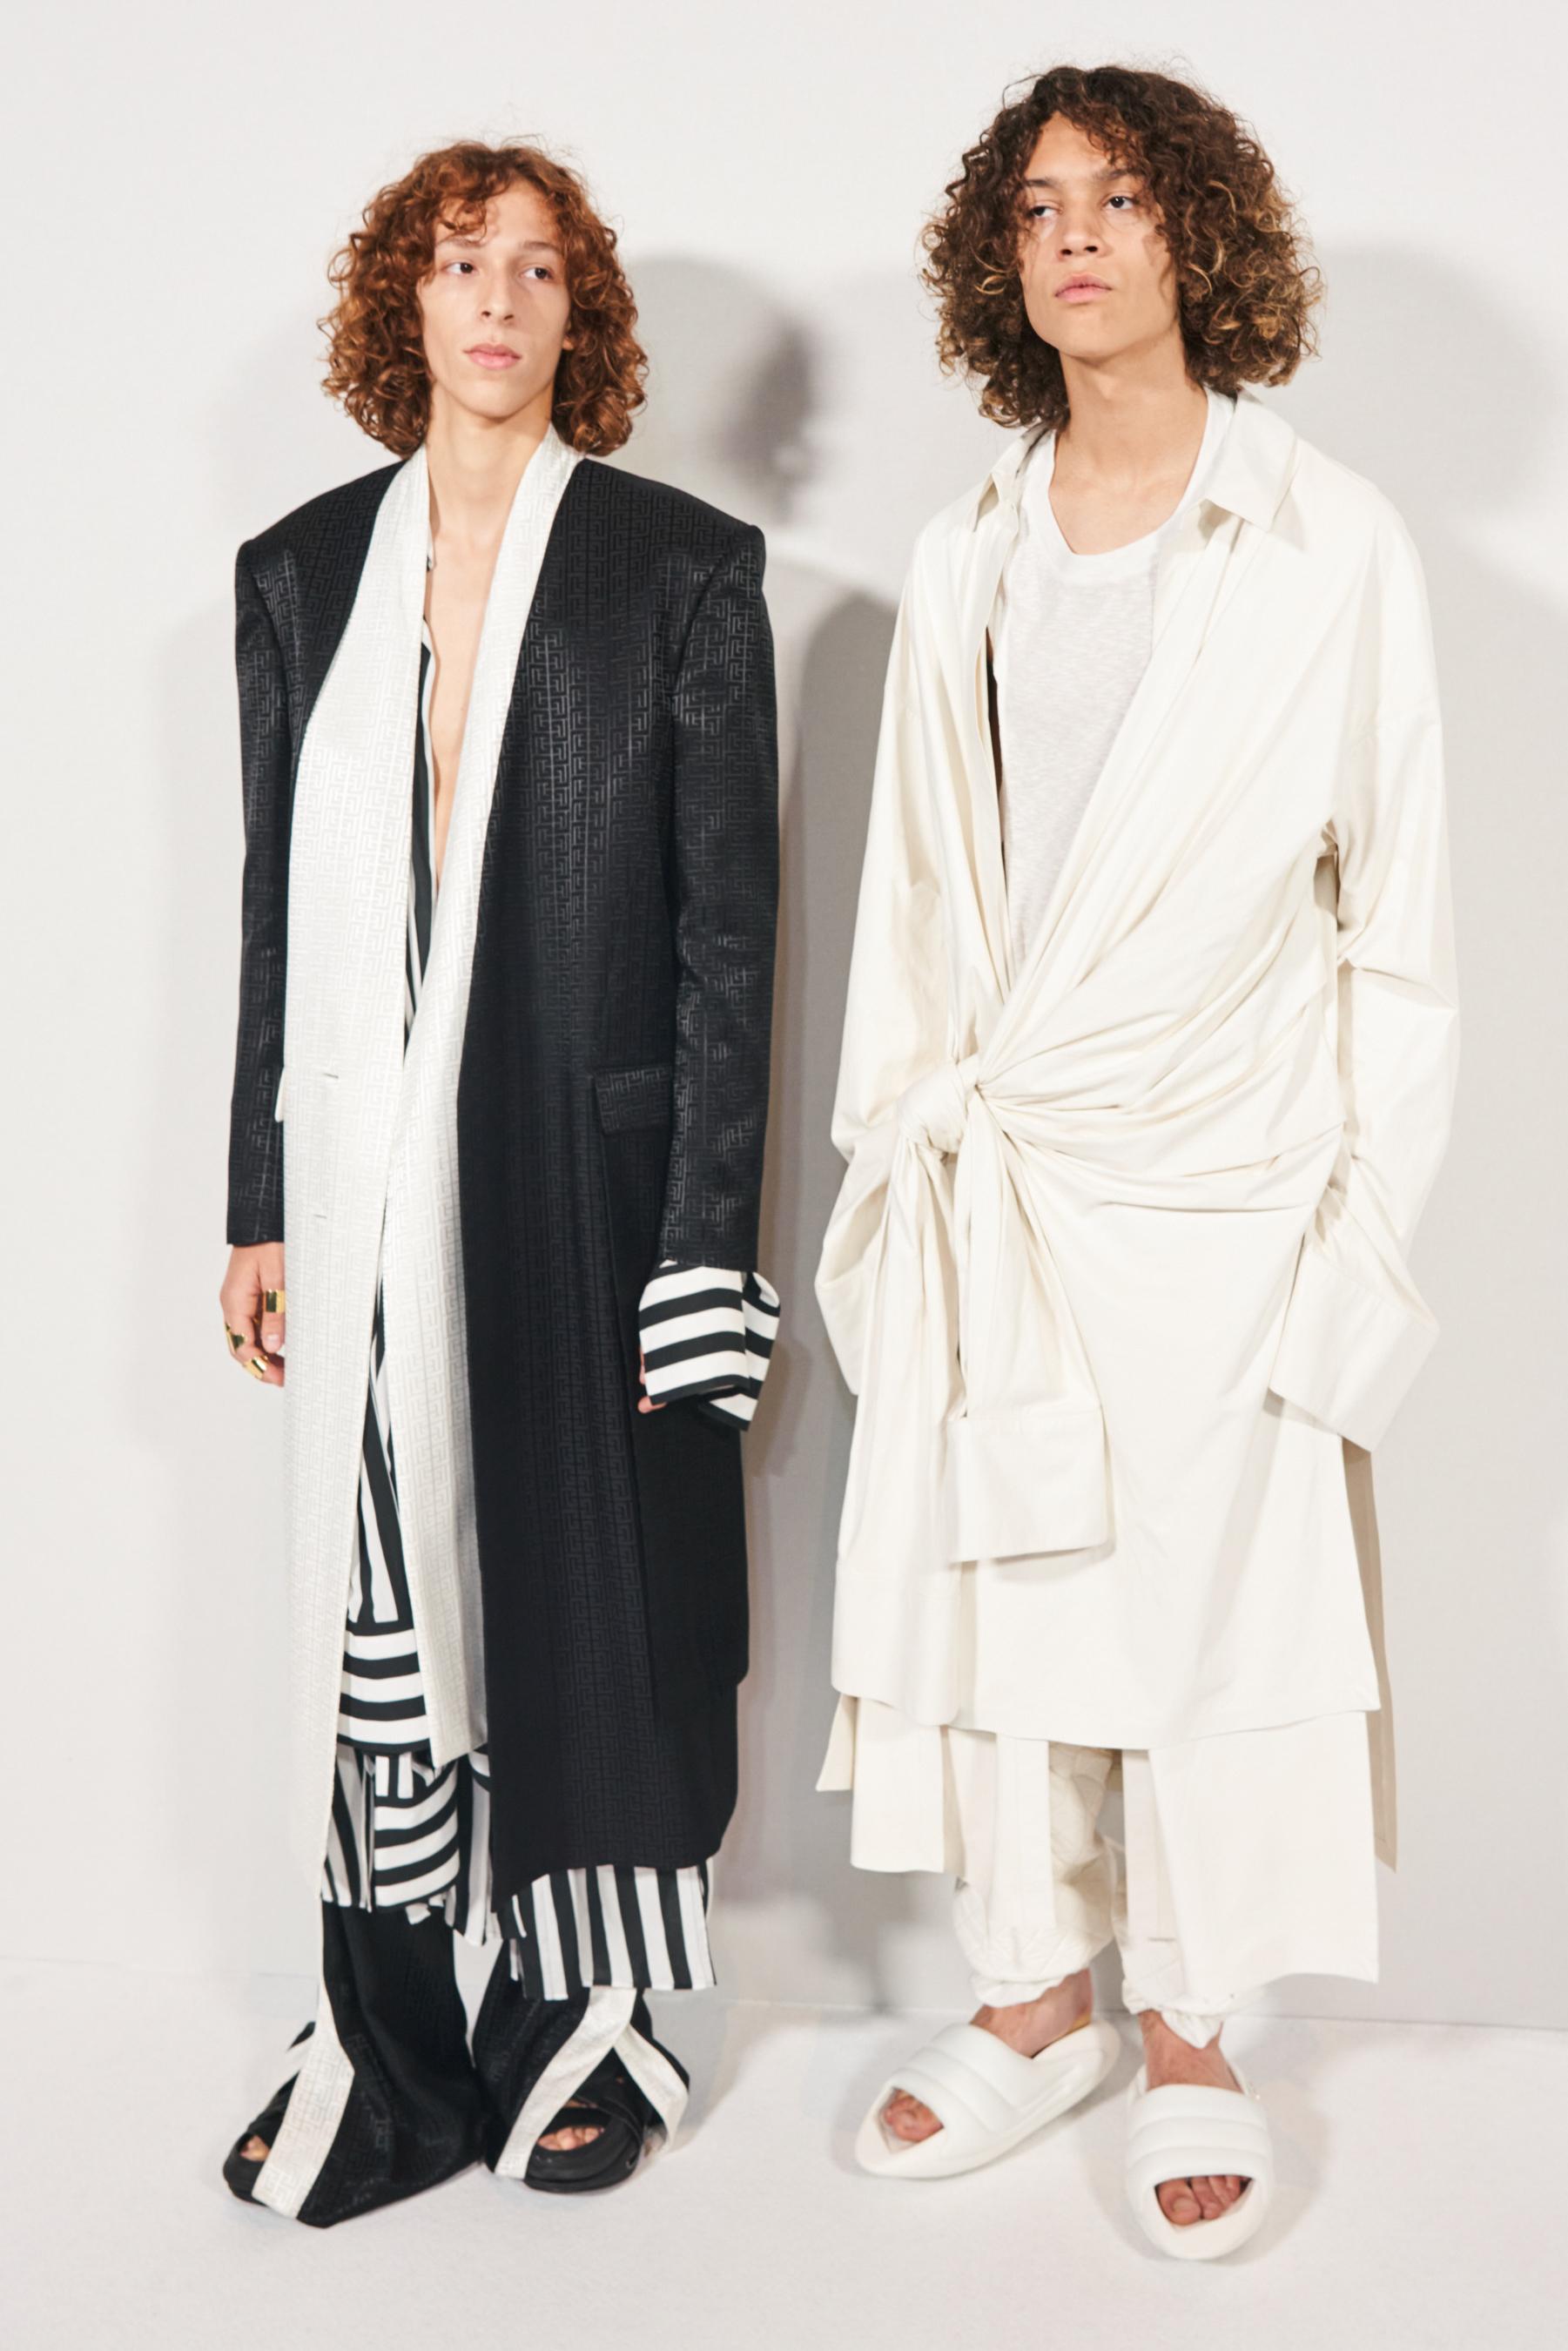 Balmain Spring 2022 Backstage Fashion Show